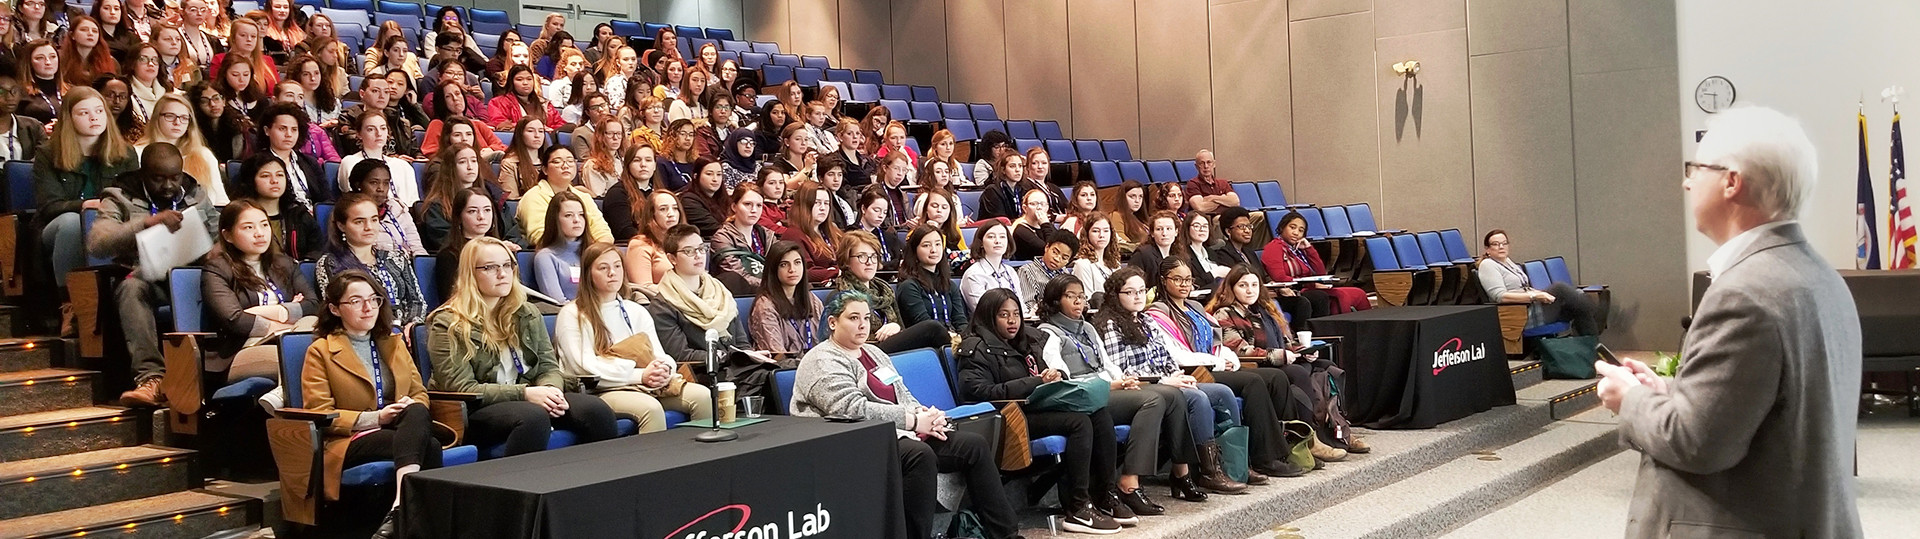 Jefferson Lab Conferences & Collaborations